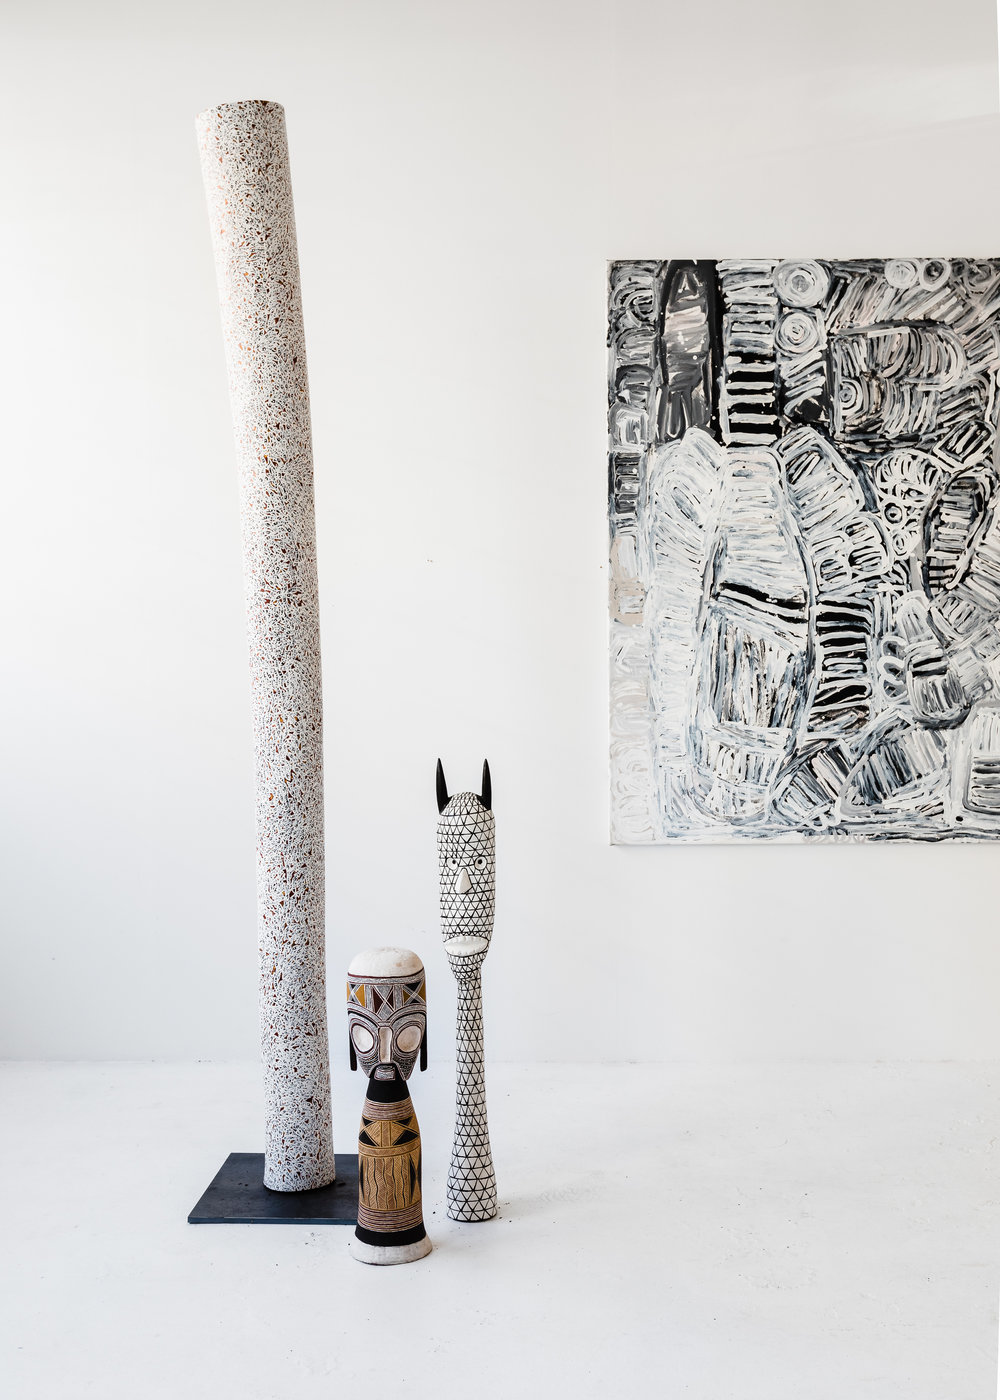 Works by Wukun Wanambi, Nawurapu Wunungmurra and Sonia Kurarra. Image courtesy Amelia Stanwix.